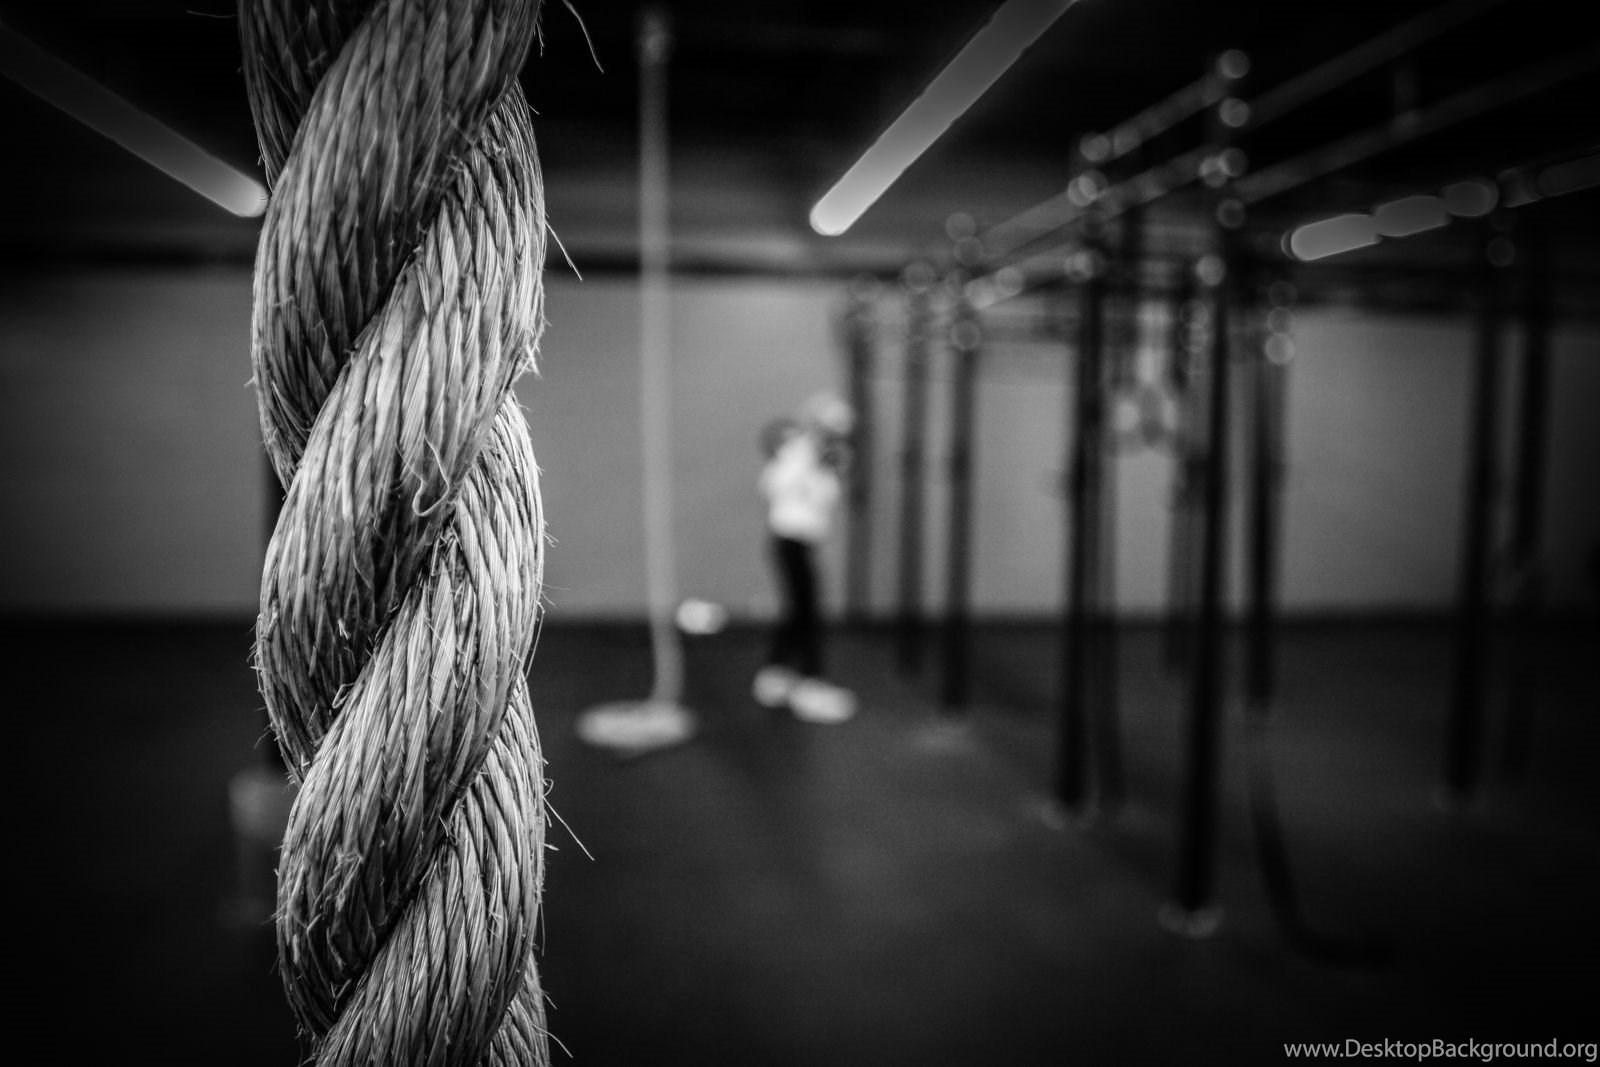 Gym backgrounds wallpapers desktop background - Fitness wallpapers for desktop ...